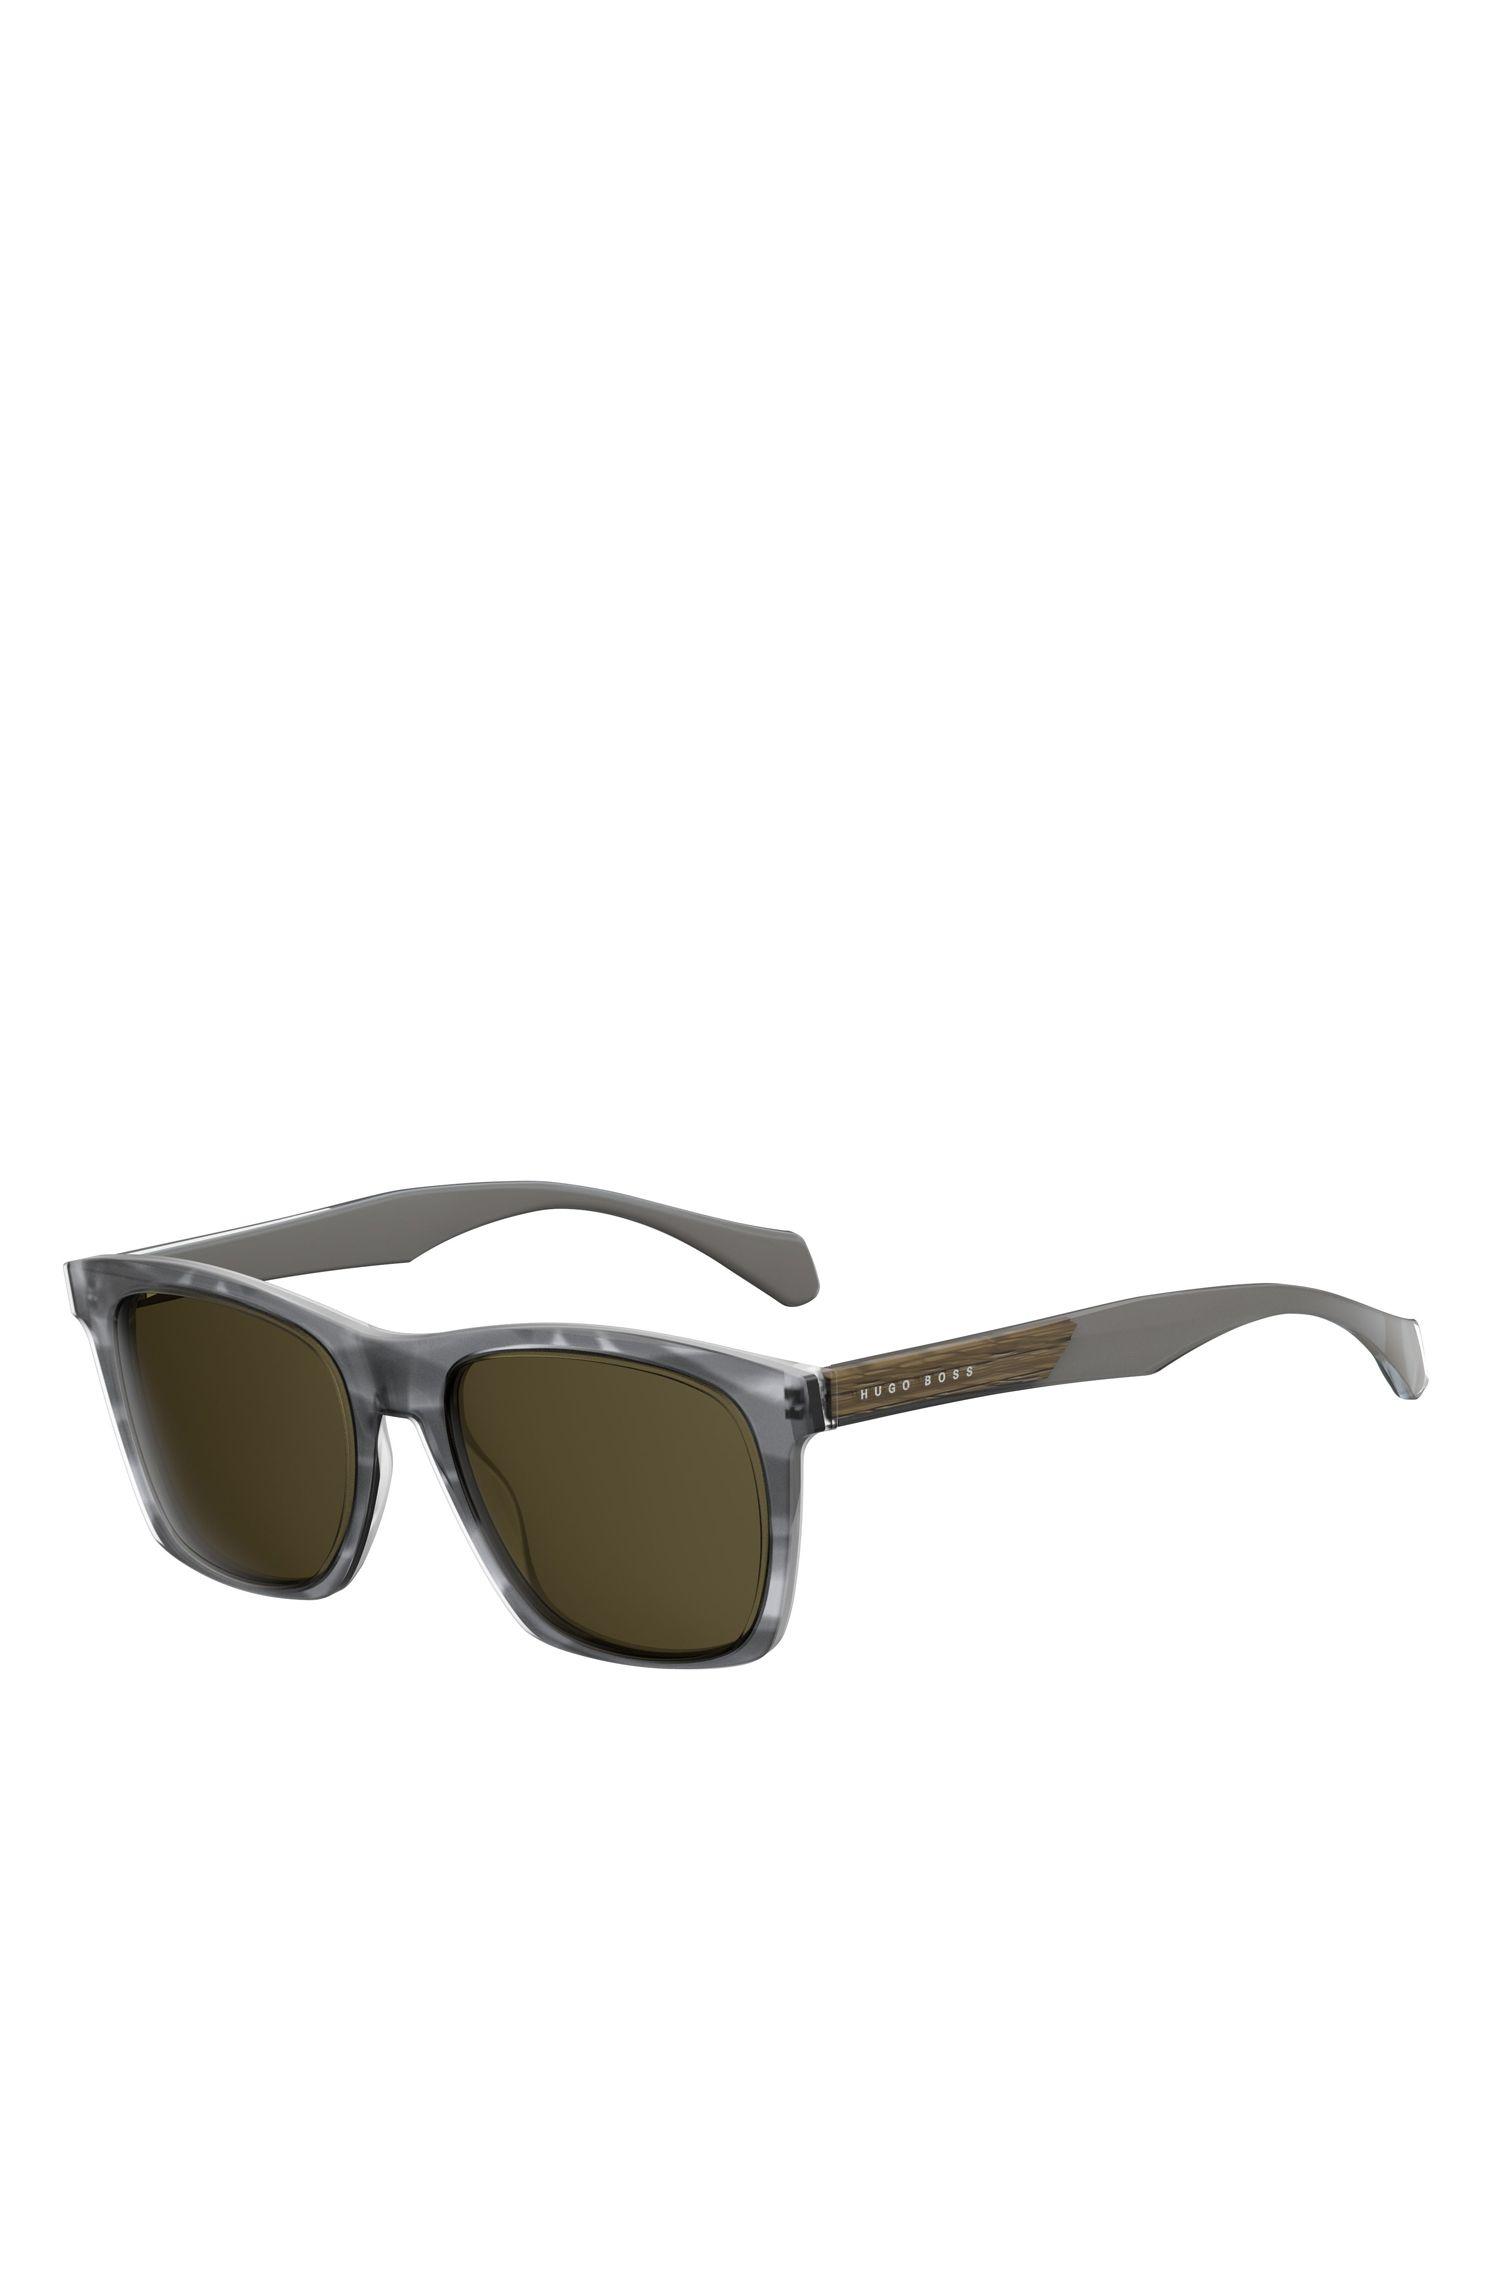 'BOSS 0911/S' | Grey Acetate Rectangular Sunglasses